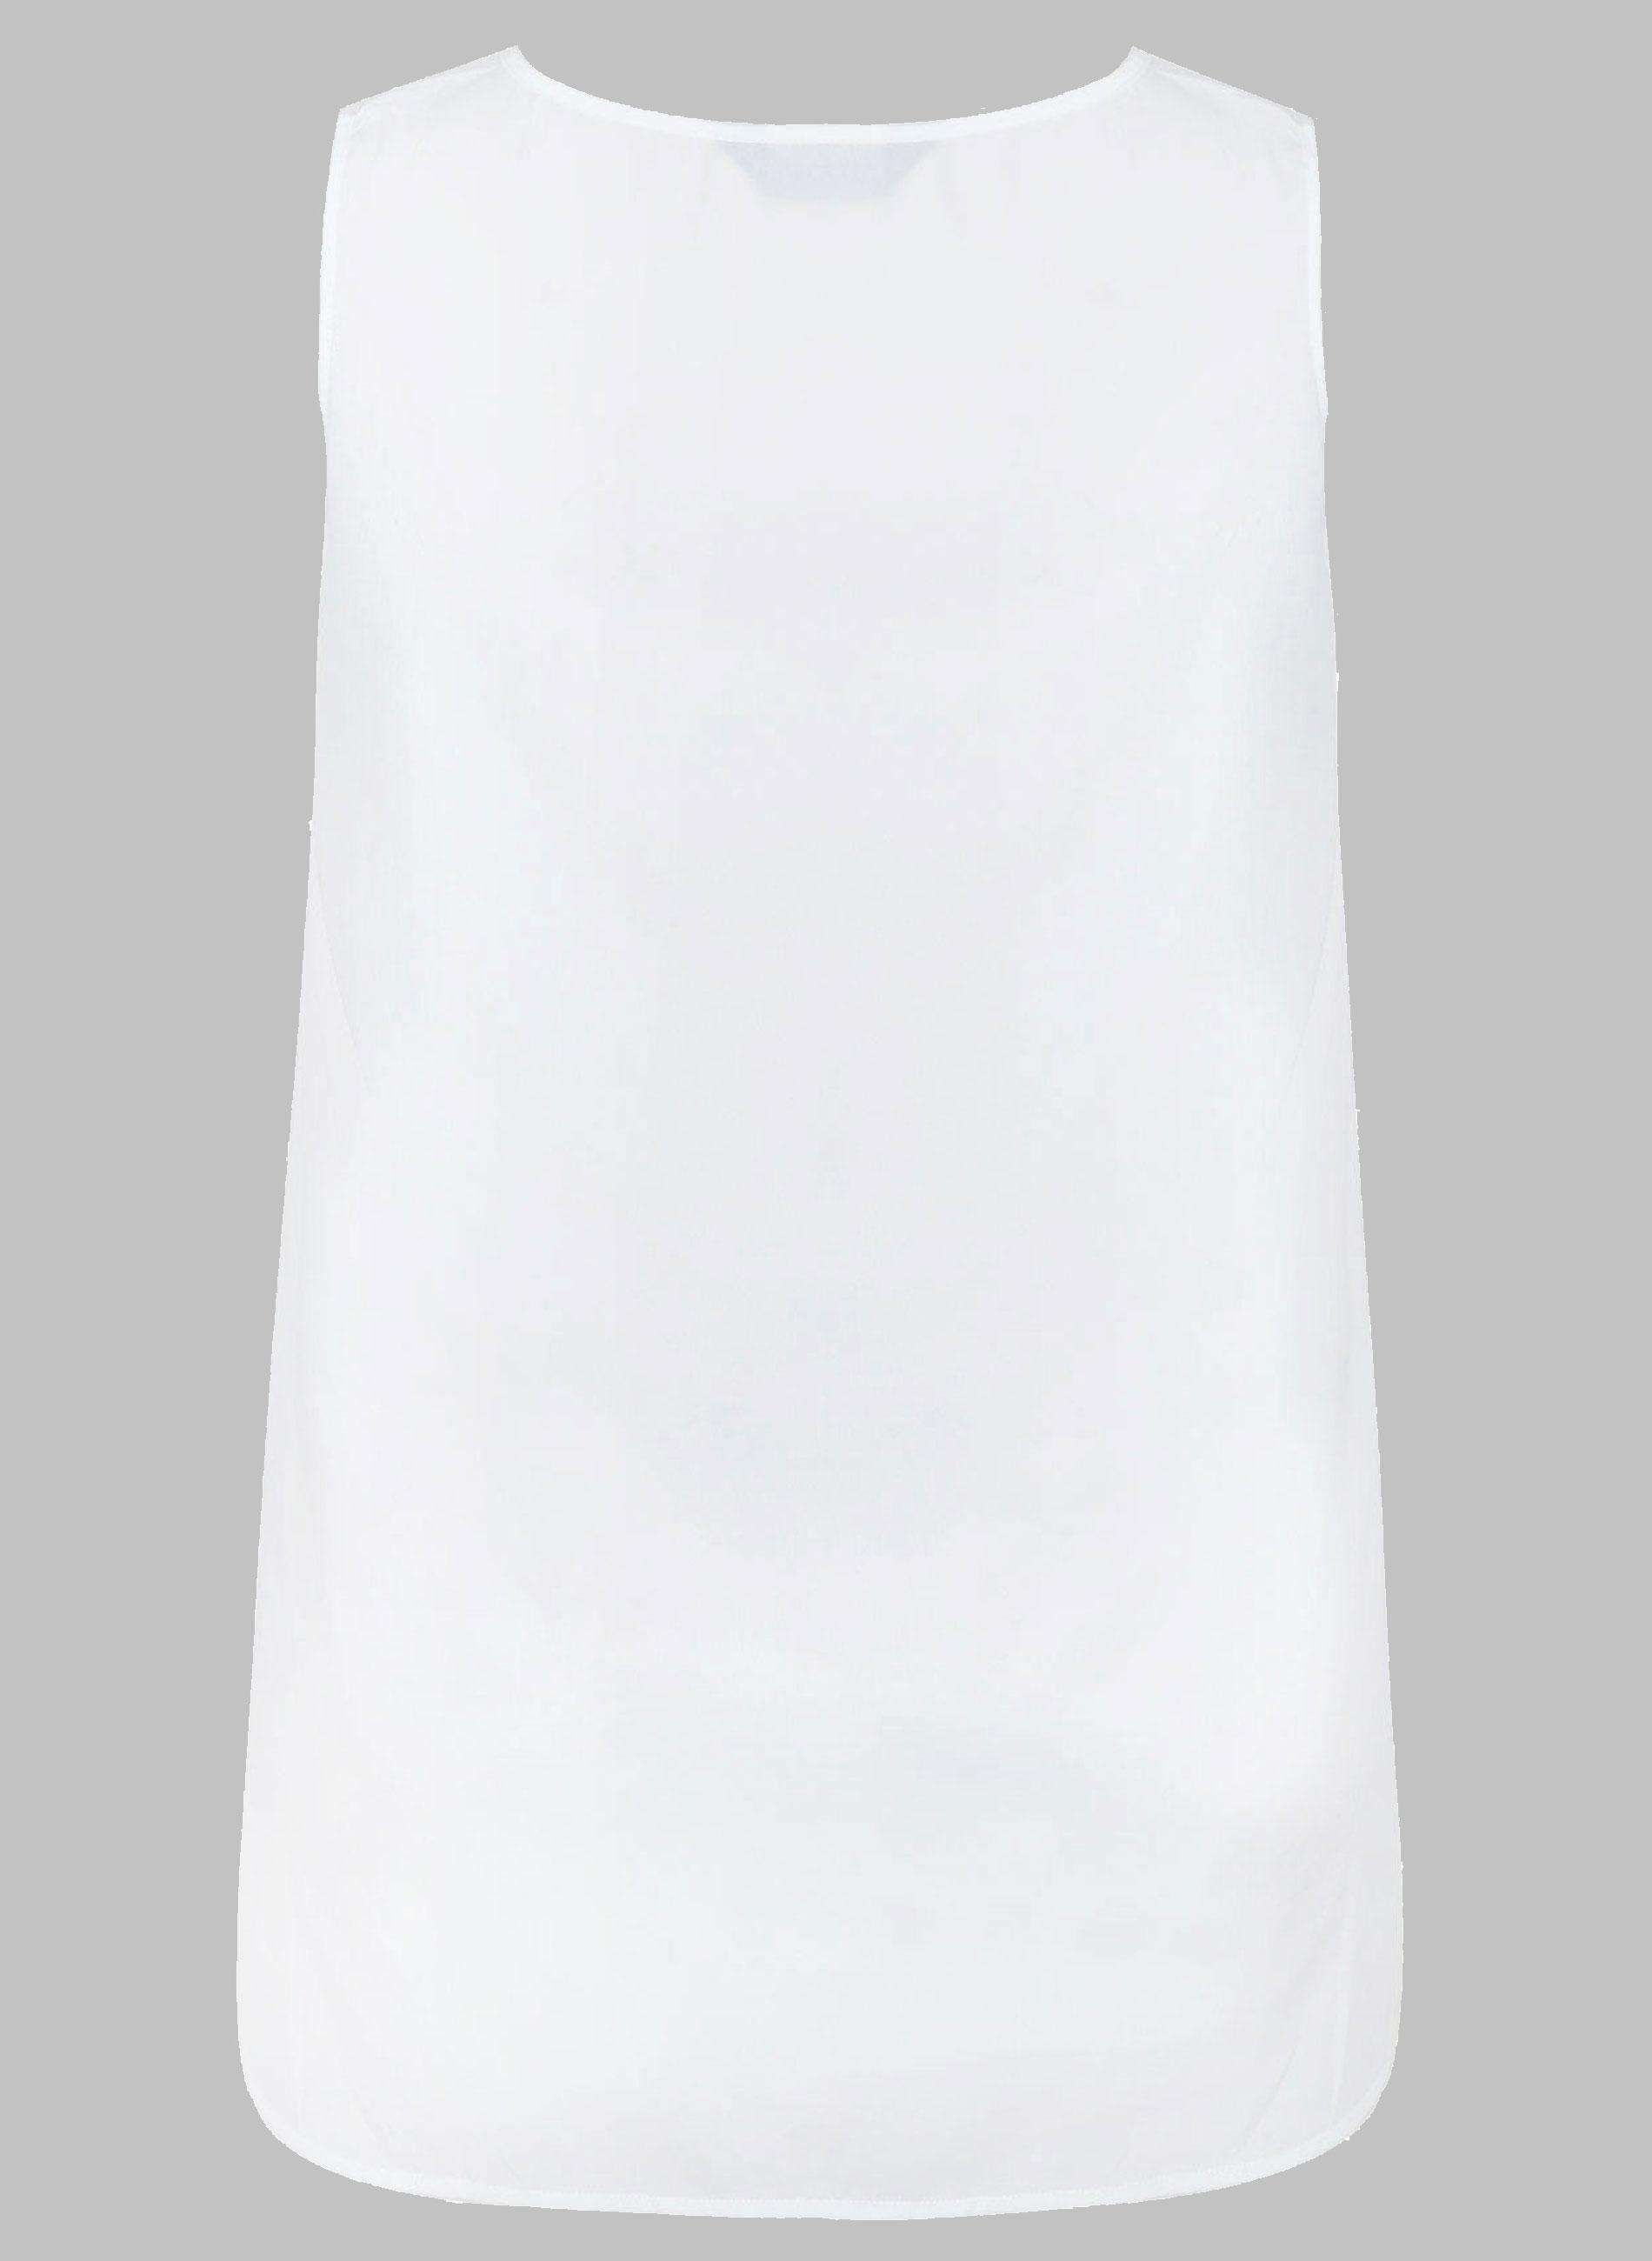 f886078df864 ΠΡΟΣΦΟΡΕΣ    ΜΠΛΟΥΖΕΣ    Άσπρο Τοπ με Ασύμμετρη Πλάτη - Μόδα σε ...